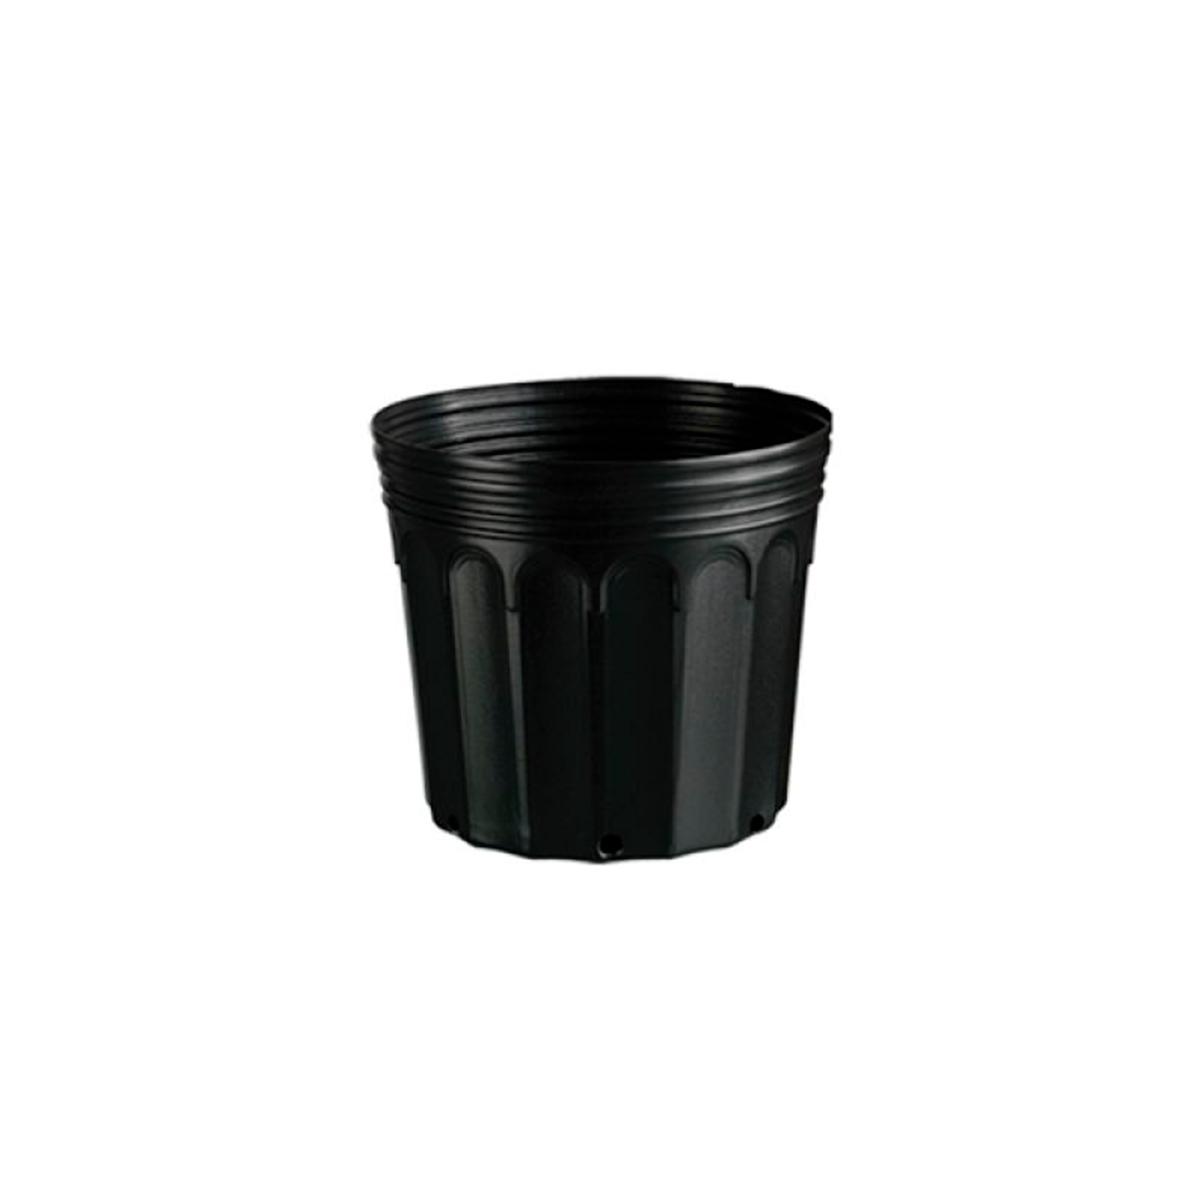 Kit 15 Embalagem para Mudas Flexível Plástico 8,5L